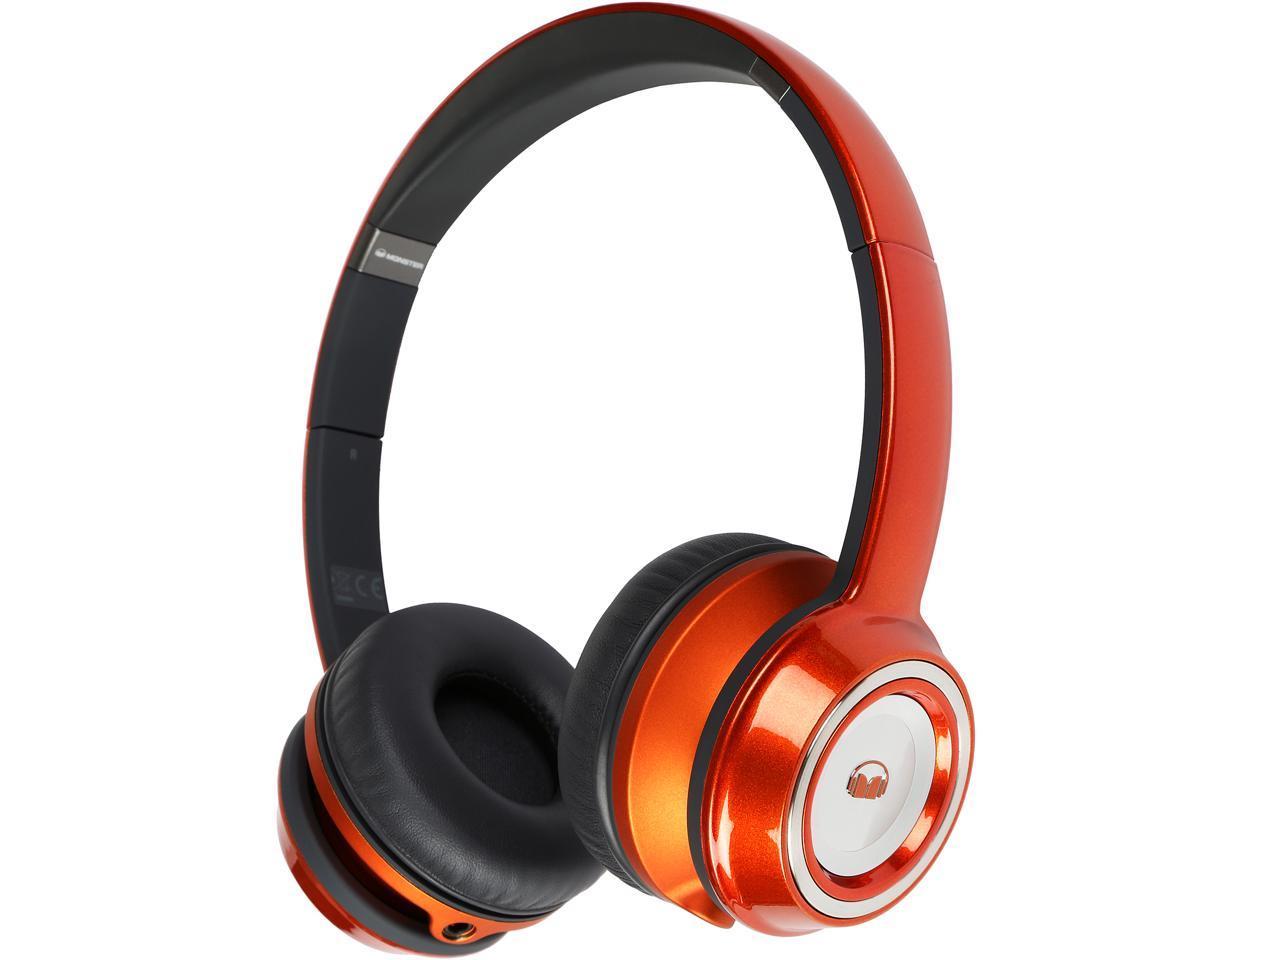 Headsets,Newegg.com